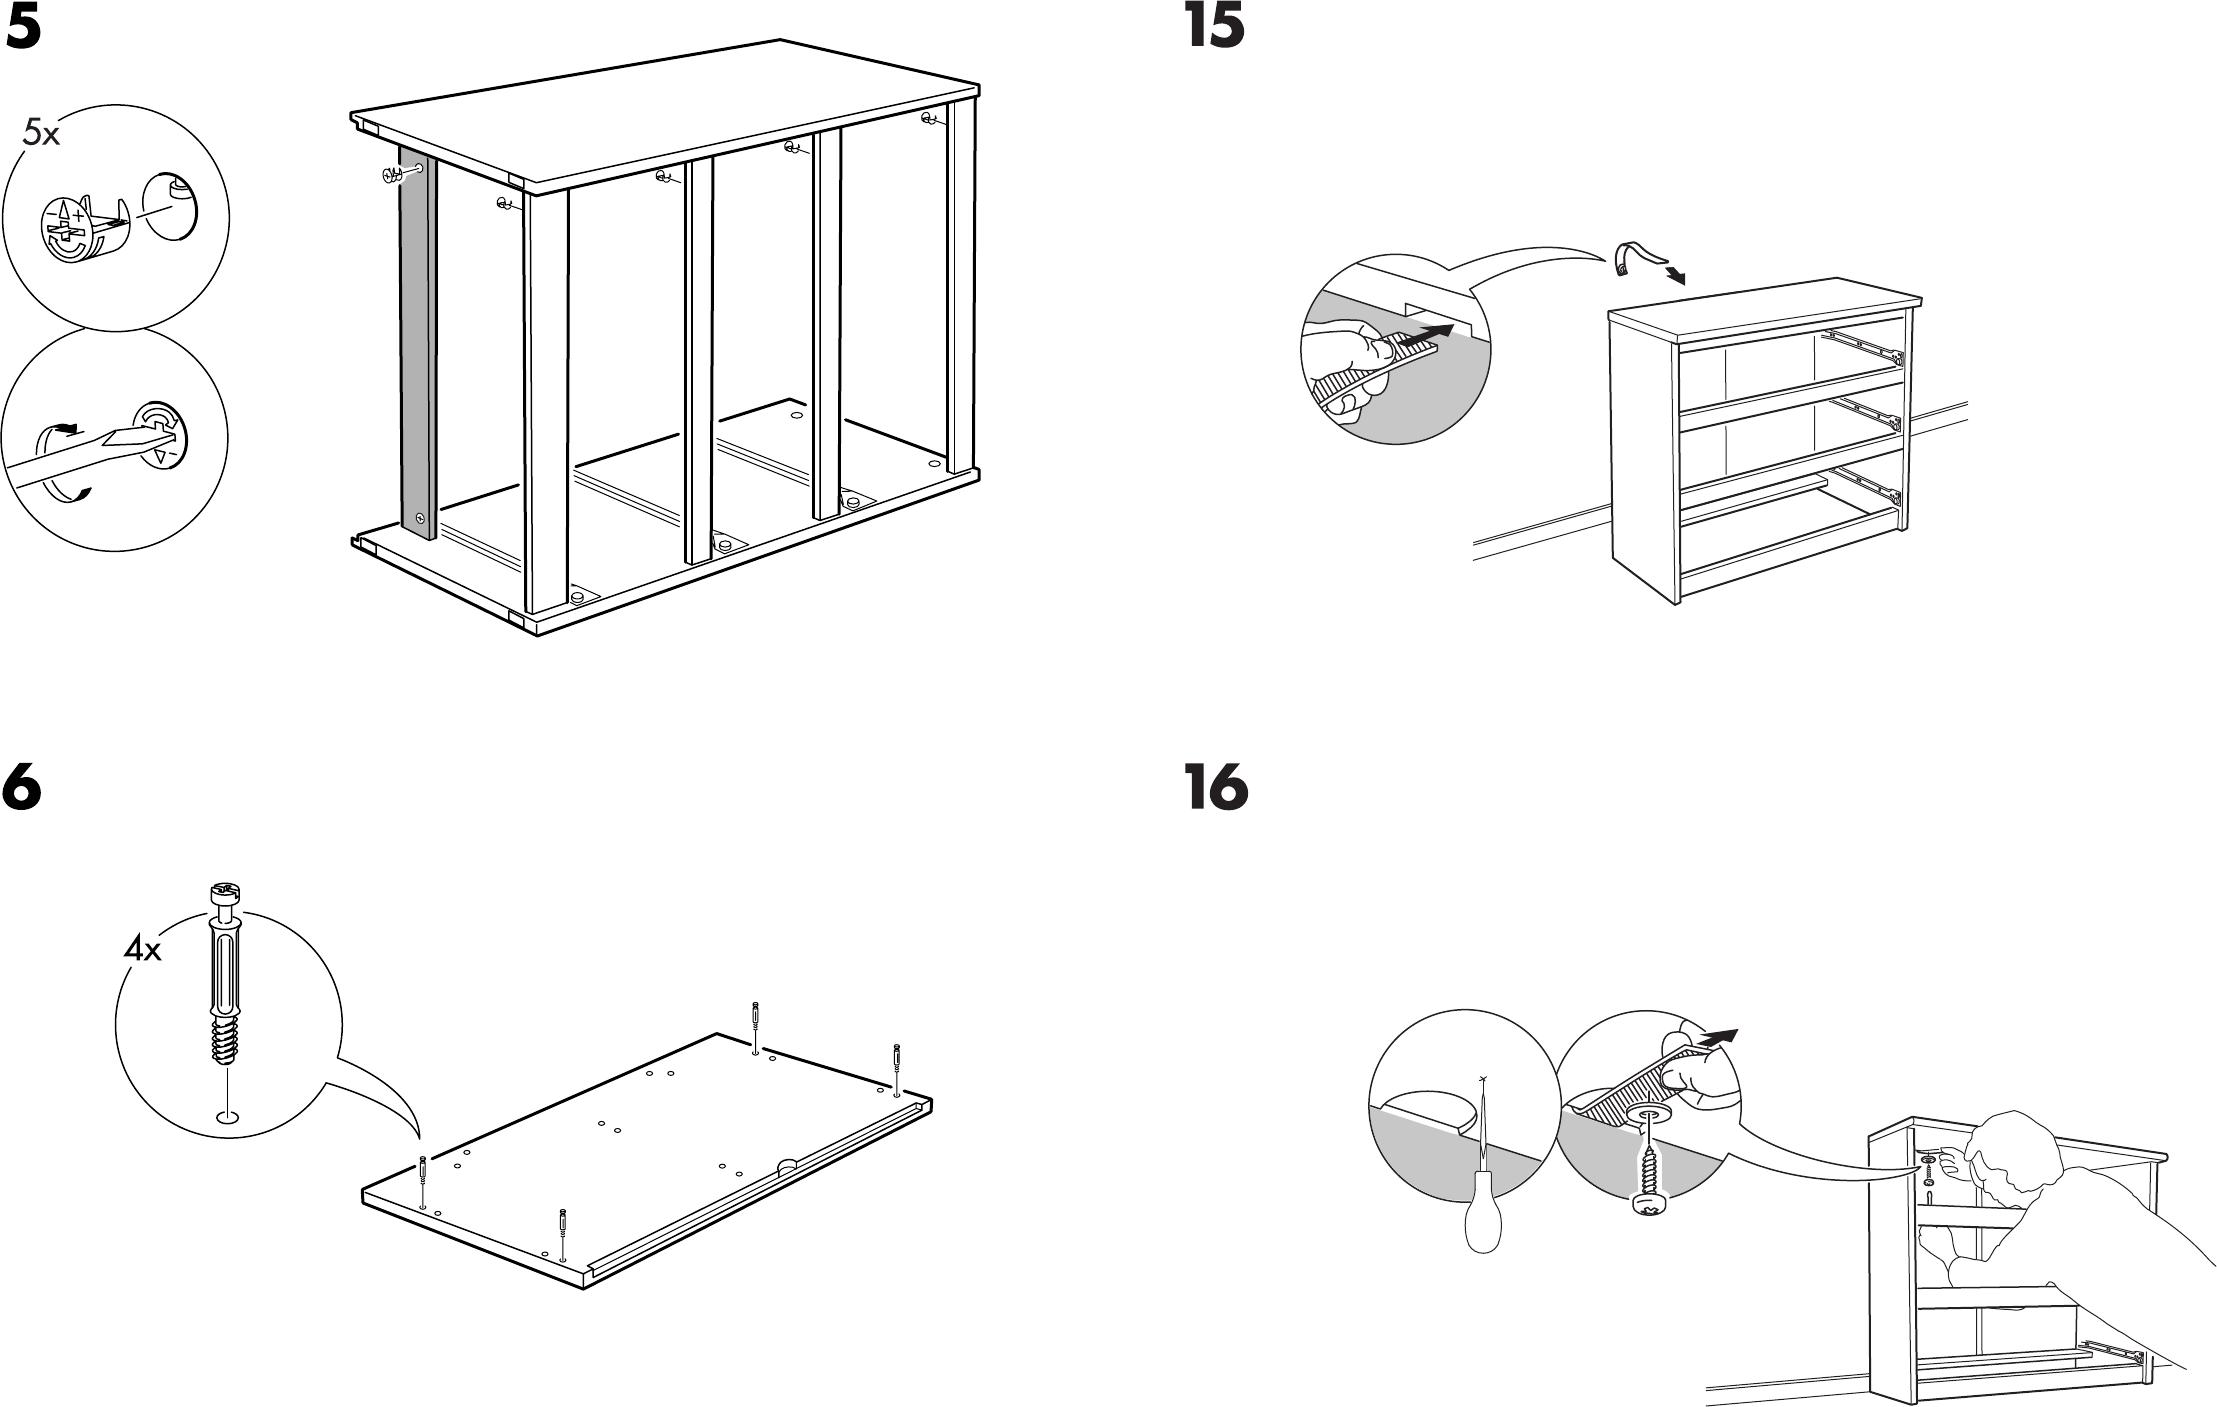 Ikea Malm Ladekast Handleiding.Handleiding Ikea Malm Ladekast 3 Pagina 6 Van 8 Dansk